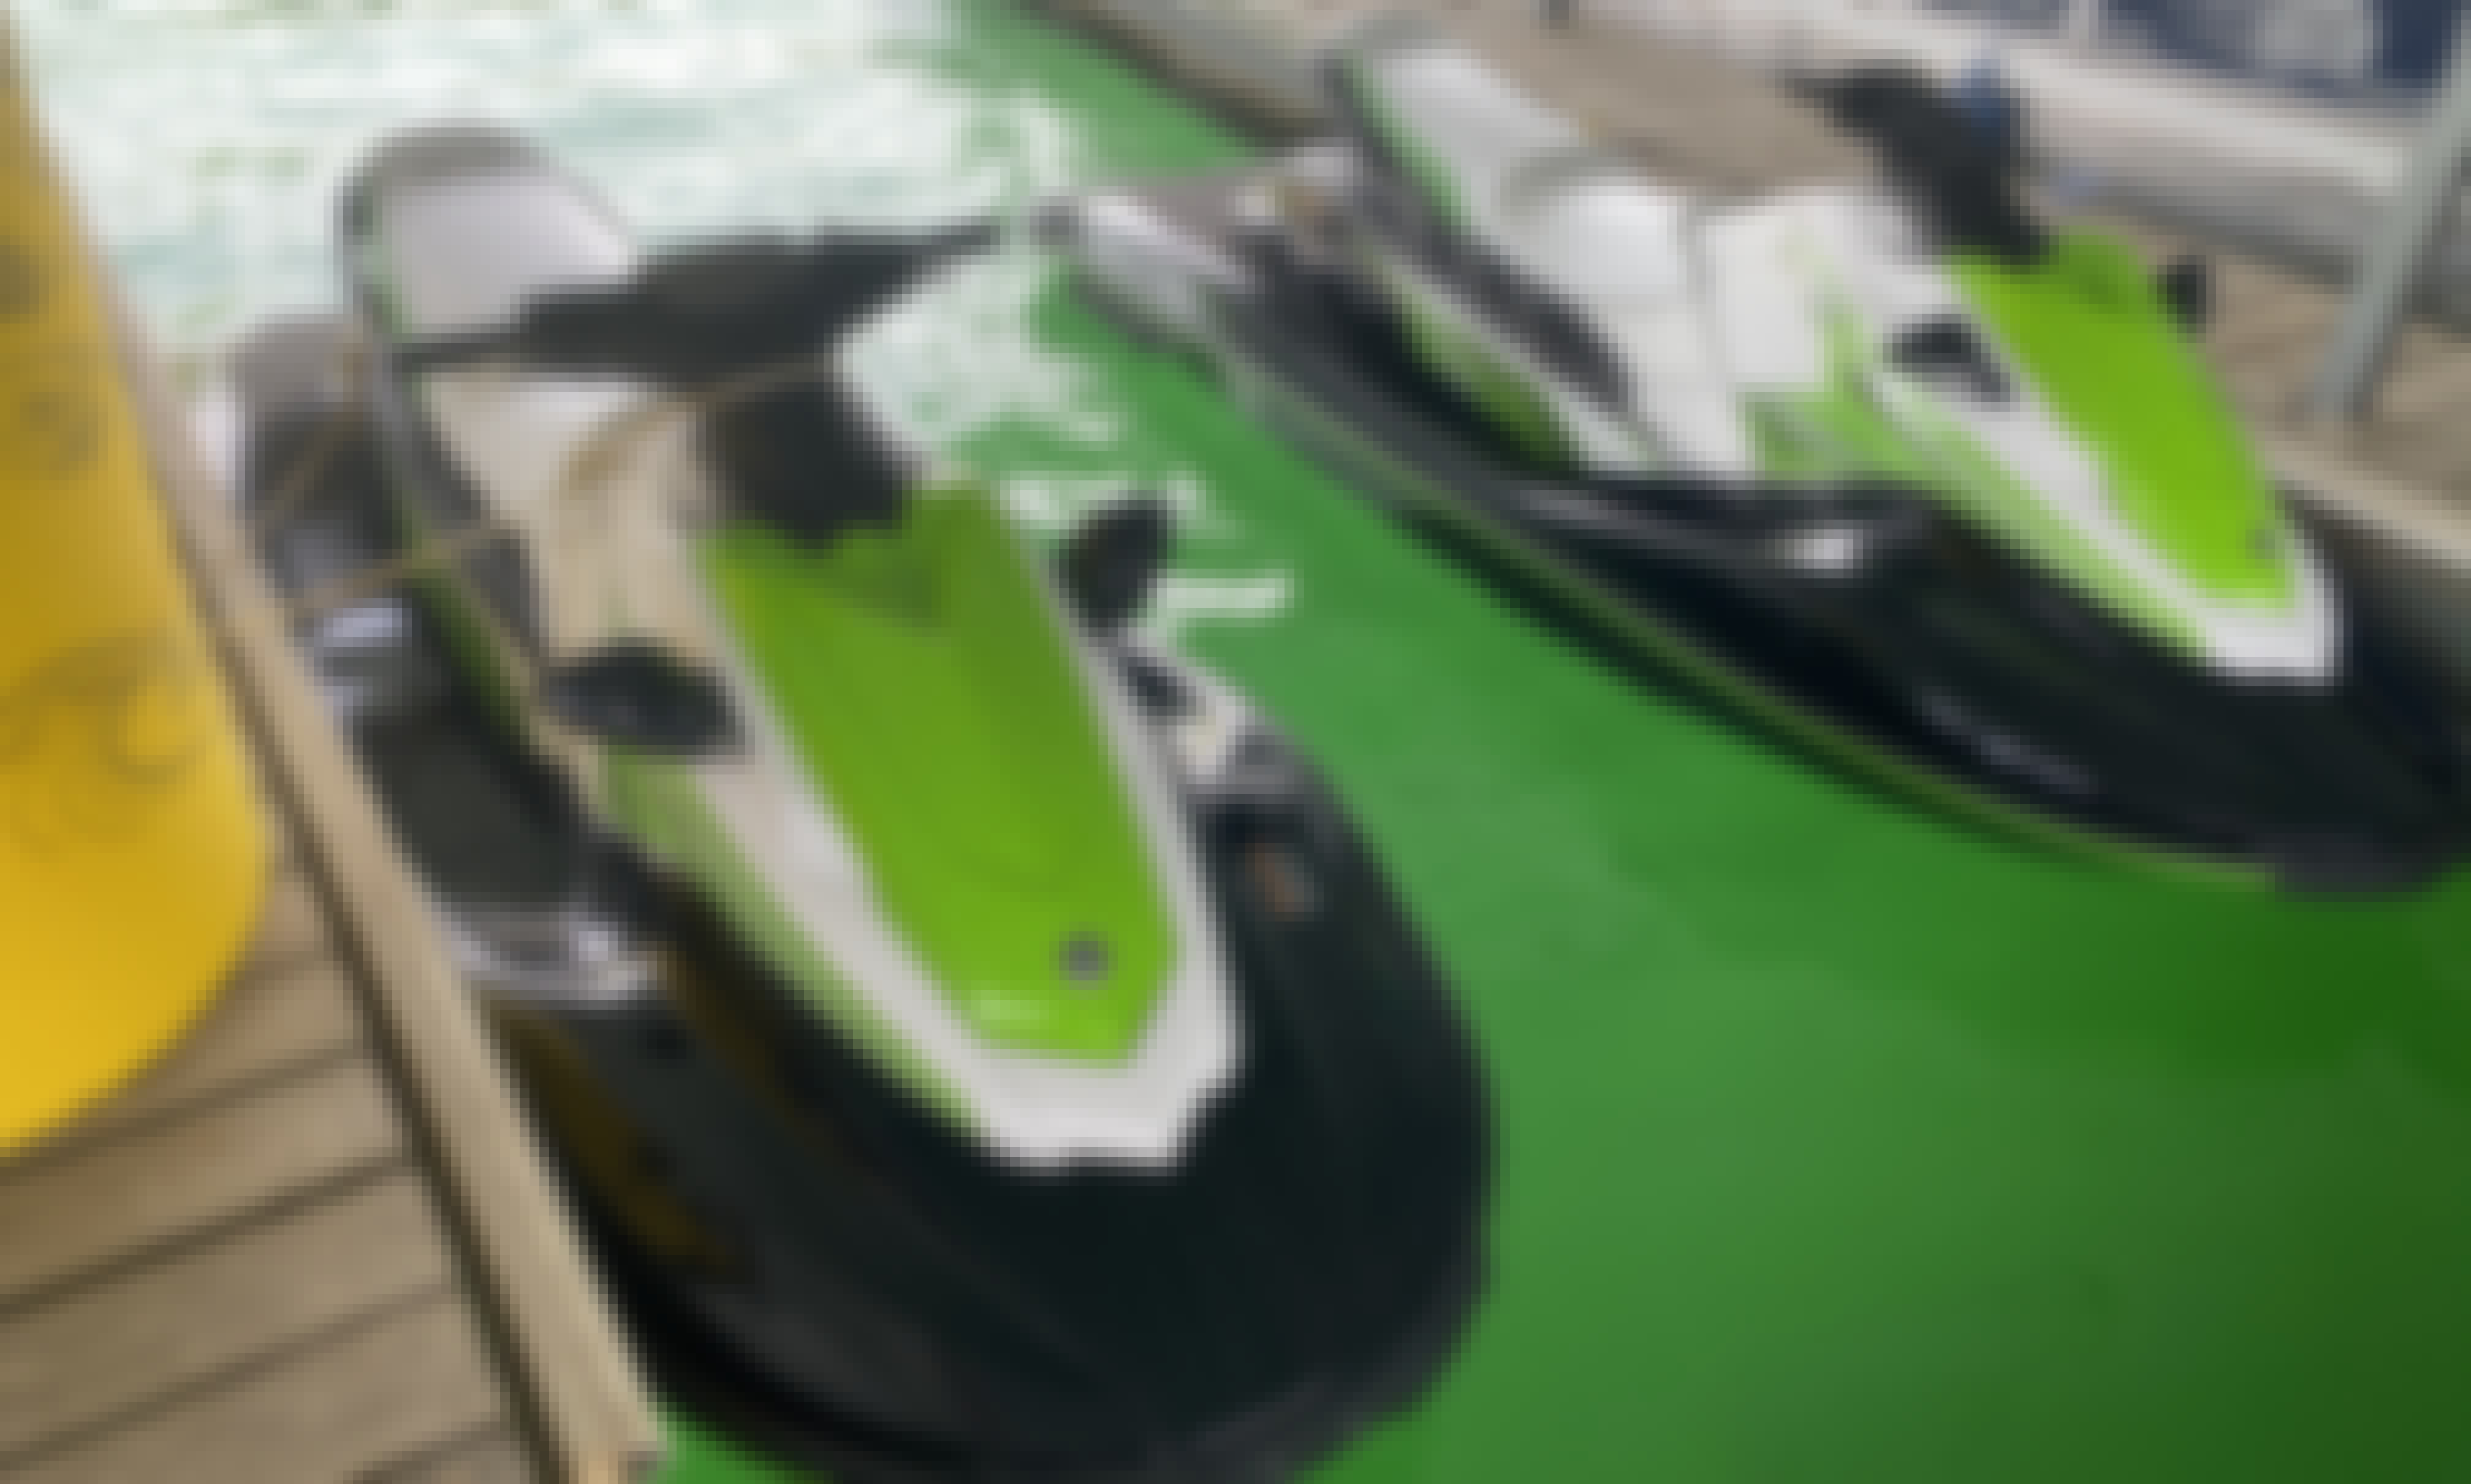 3-Seater Yamaha EX Jet Ski For Rent In Austin Texas.